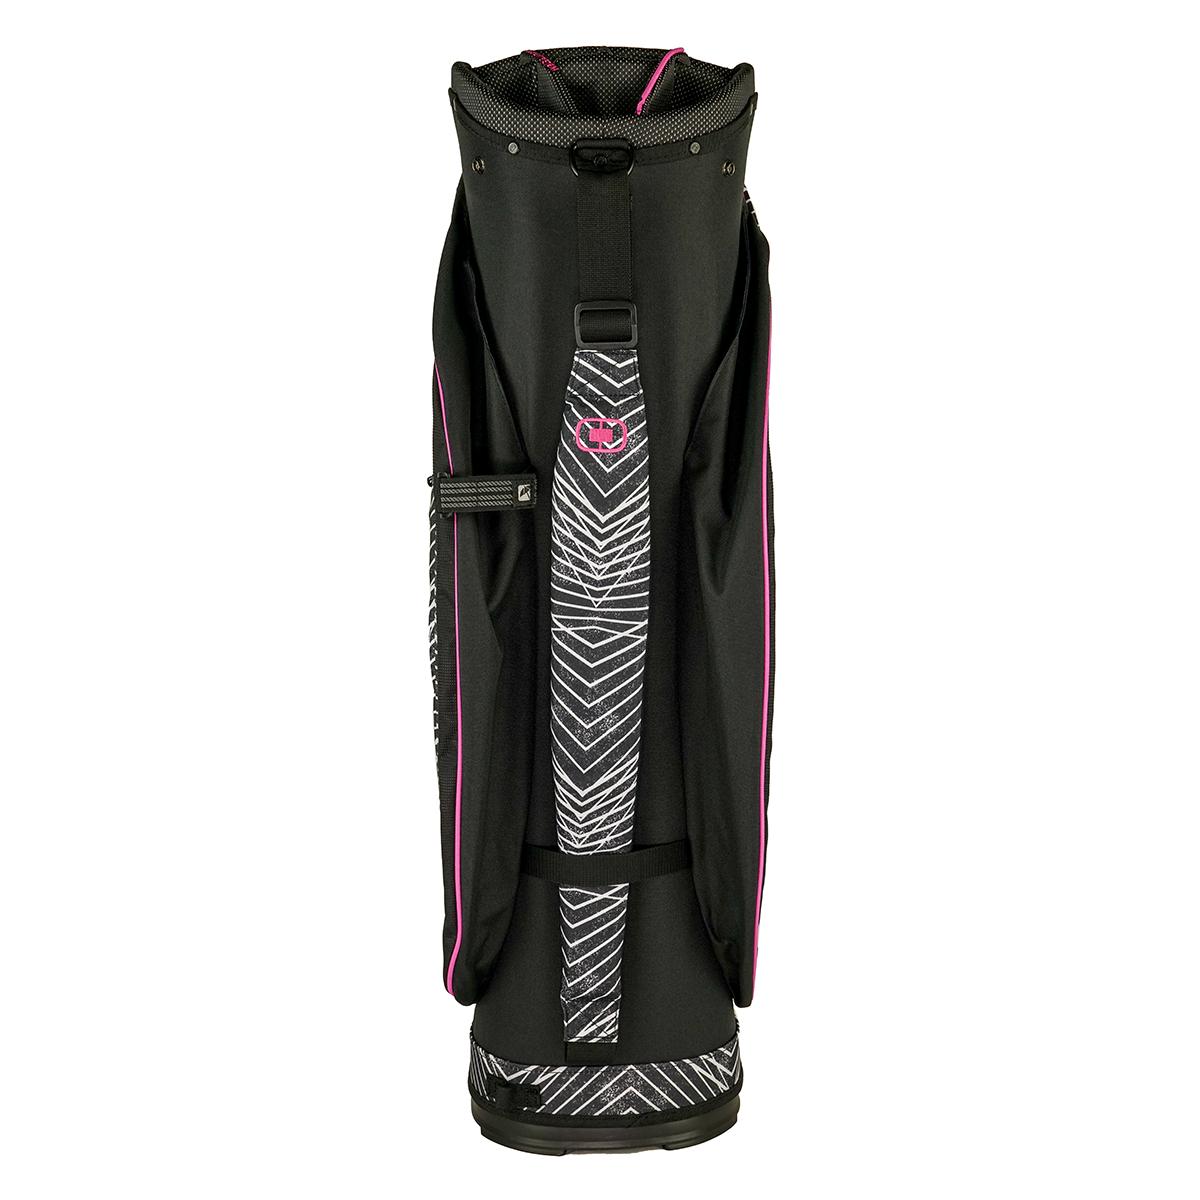 OGIO-Women-039-s-Duchess-Cart-Bag